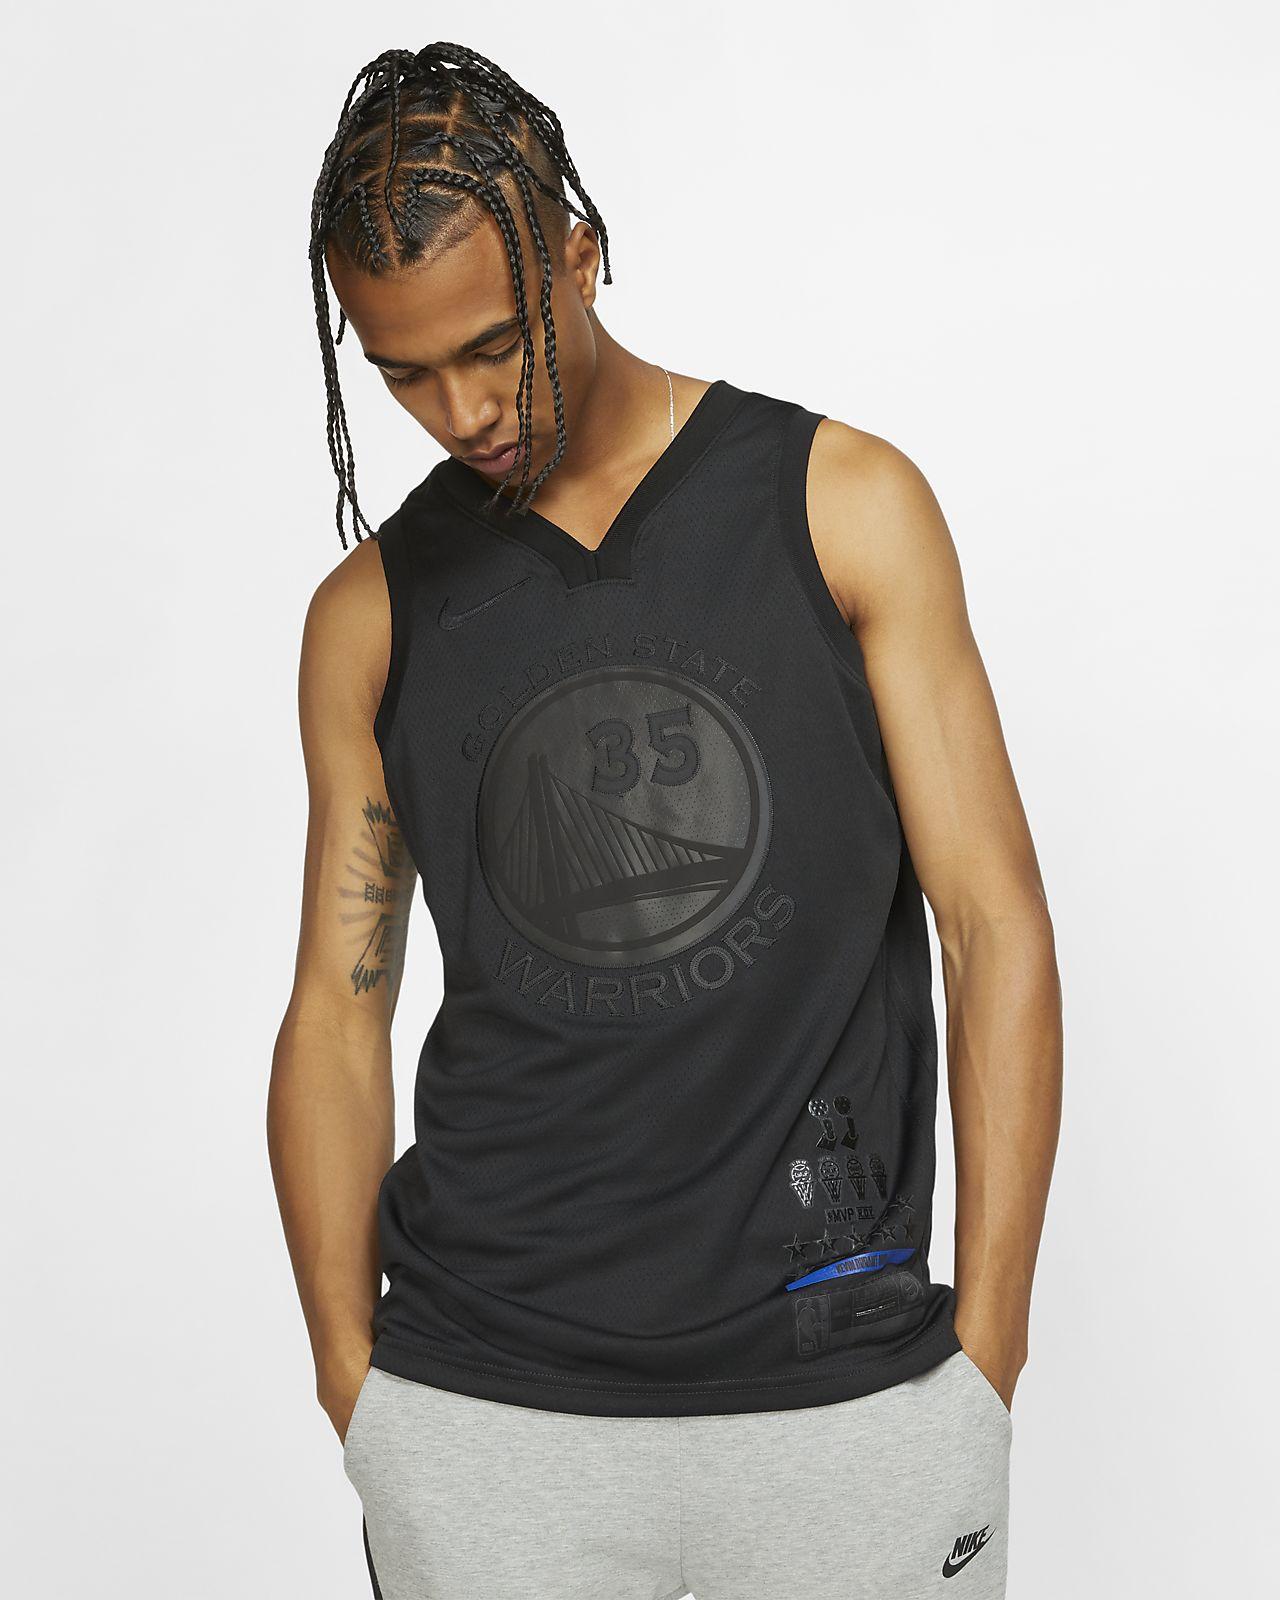 9b5c26d18e39 Men's Nike NBA Connected Jersey. Kevin Durant MVP Swingman (Golden State  Warriors)